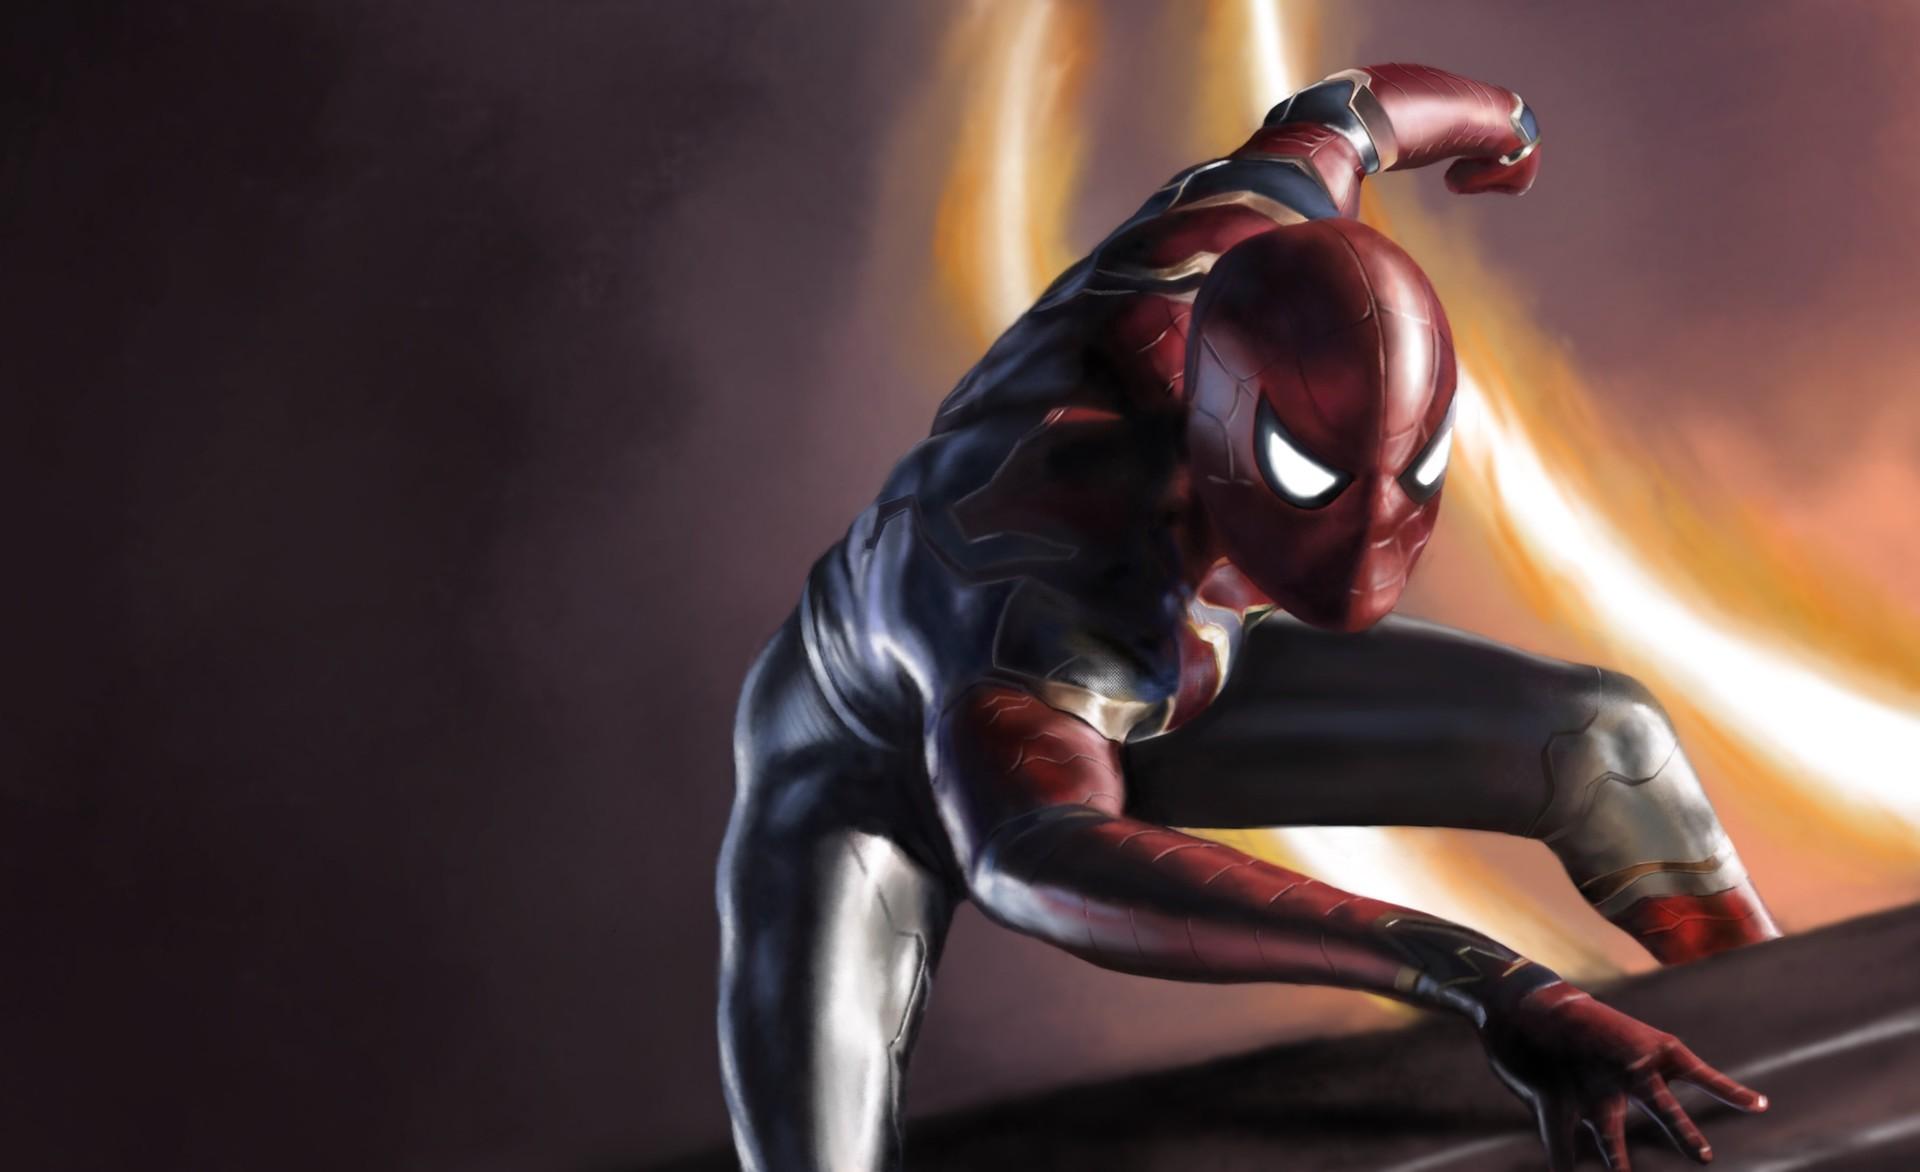 2048x2048 Anthem Ipad Air Hd 4k Wallpapers Images: 2048x2048 Spiderman Avengers Infinity War Ipad Air HD 4k